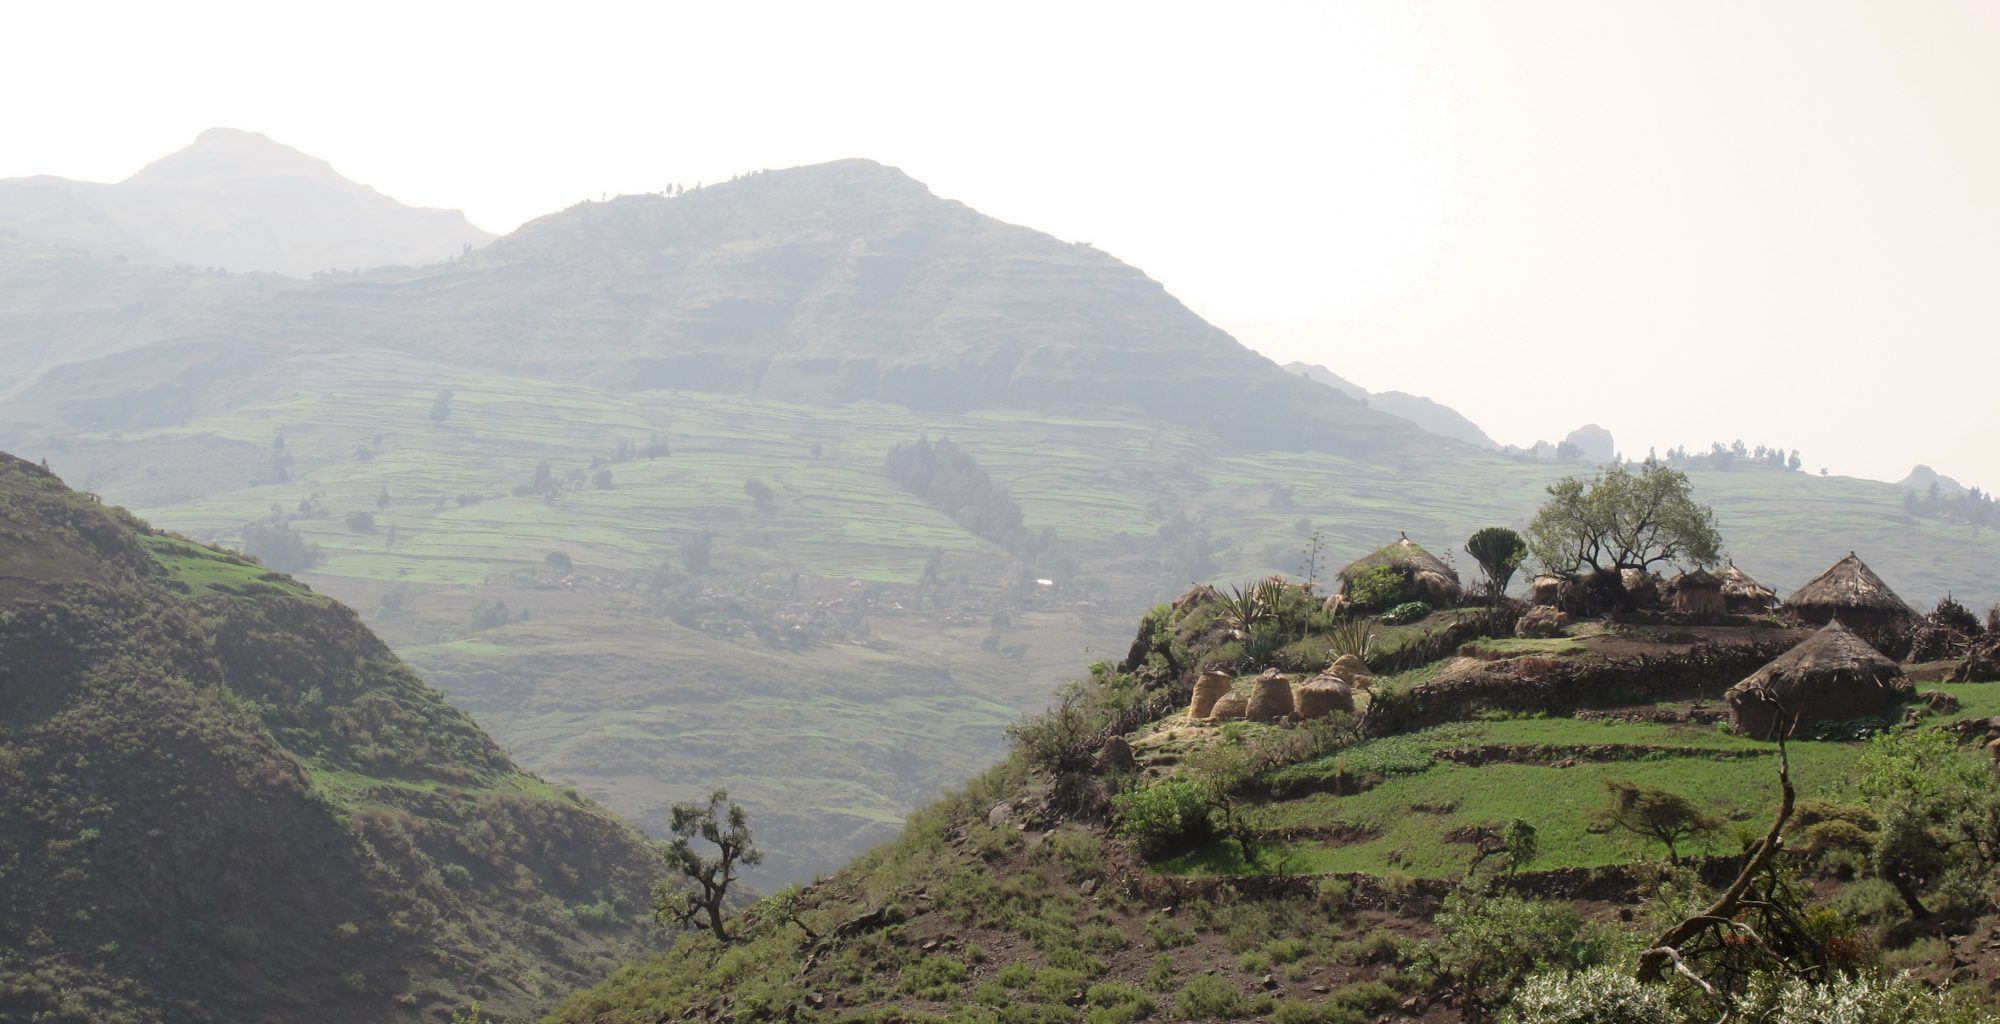 Ethiopia-Tukul-Village-Landscape